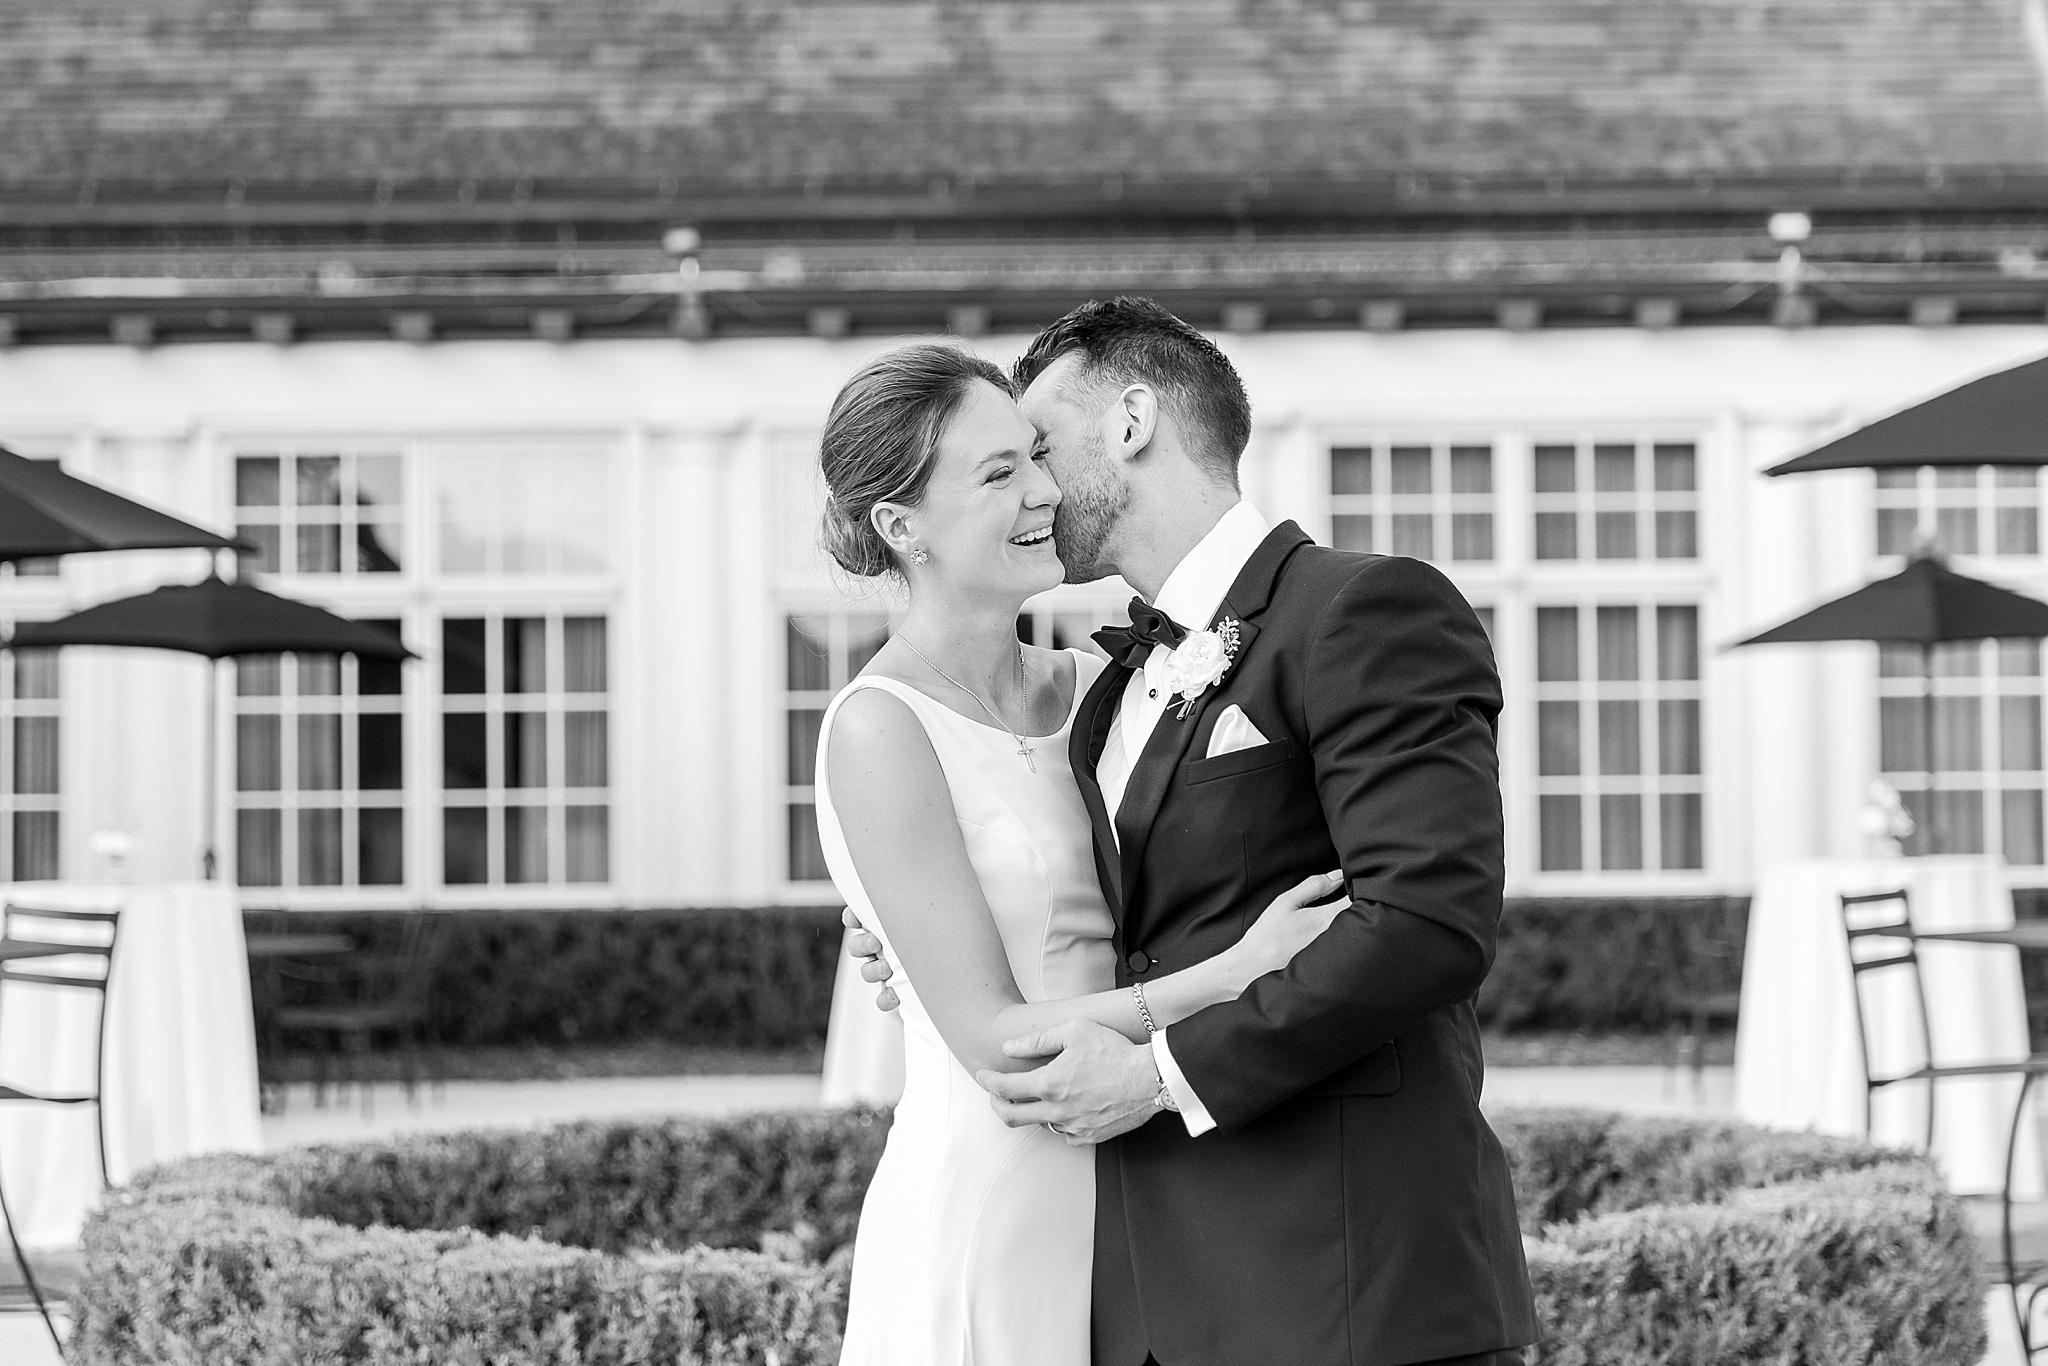 detroit-wedding-photographer-grosse-pointe-academy-chapel-detroit-golf-club-wedding-carly-matt-by-courtney-carolyn-photography_0109.jpg